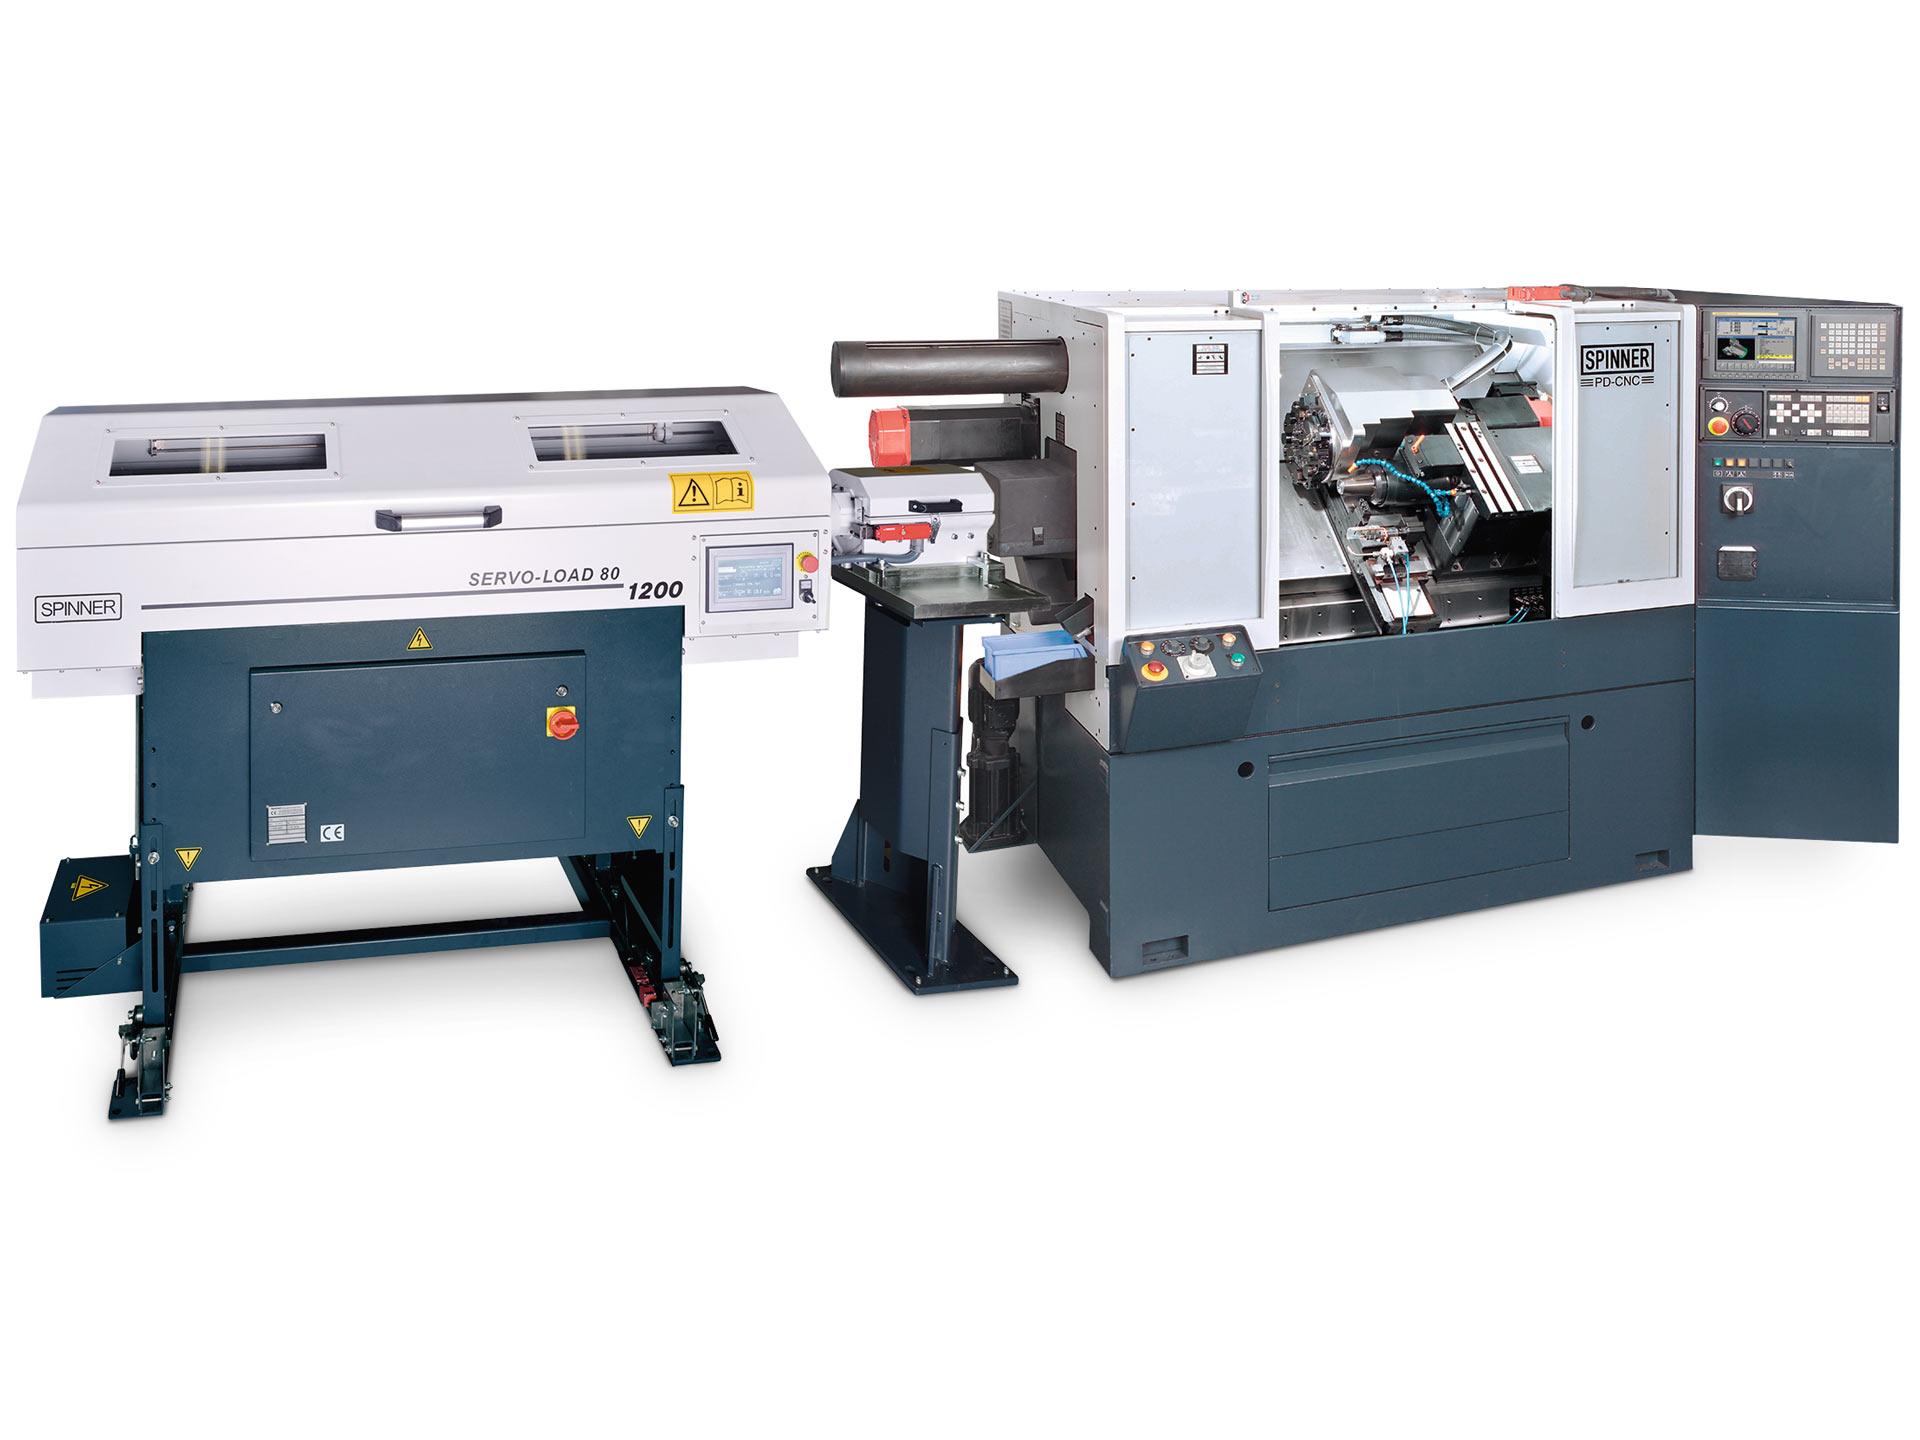 Spinner AG - Ultrapräzisionsdrehmaschine PD - Stangenlader Servoload